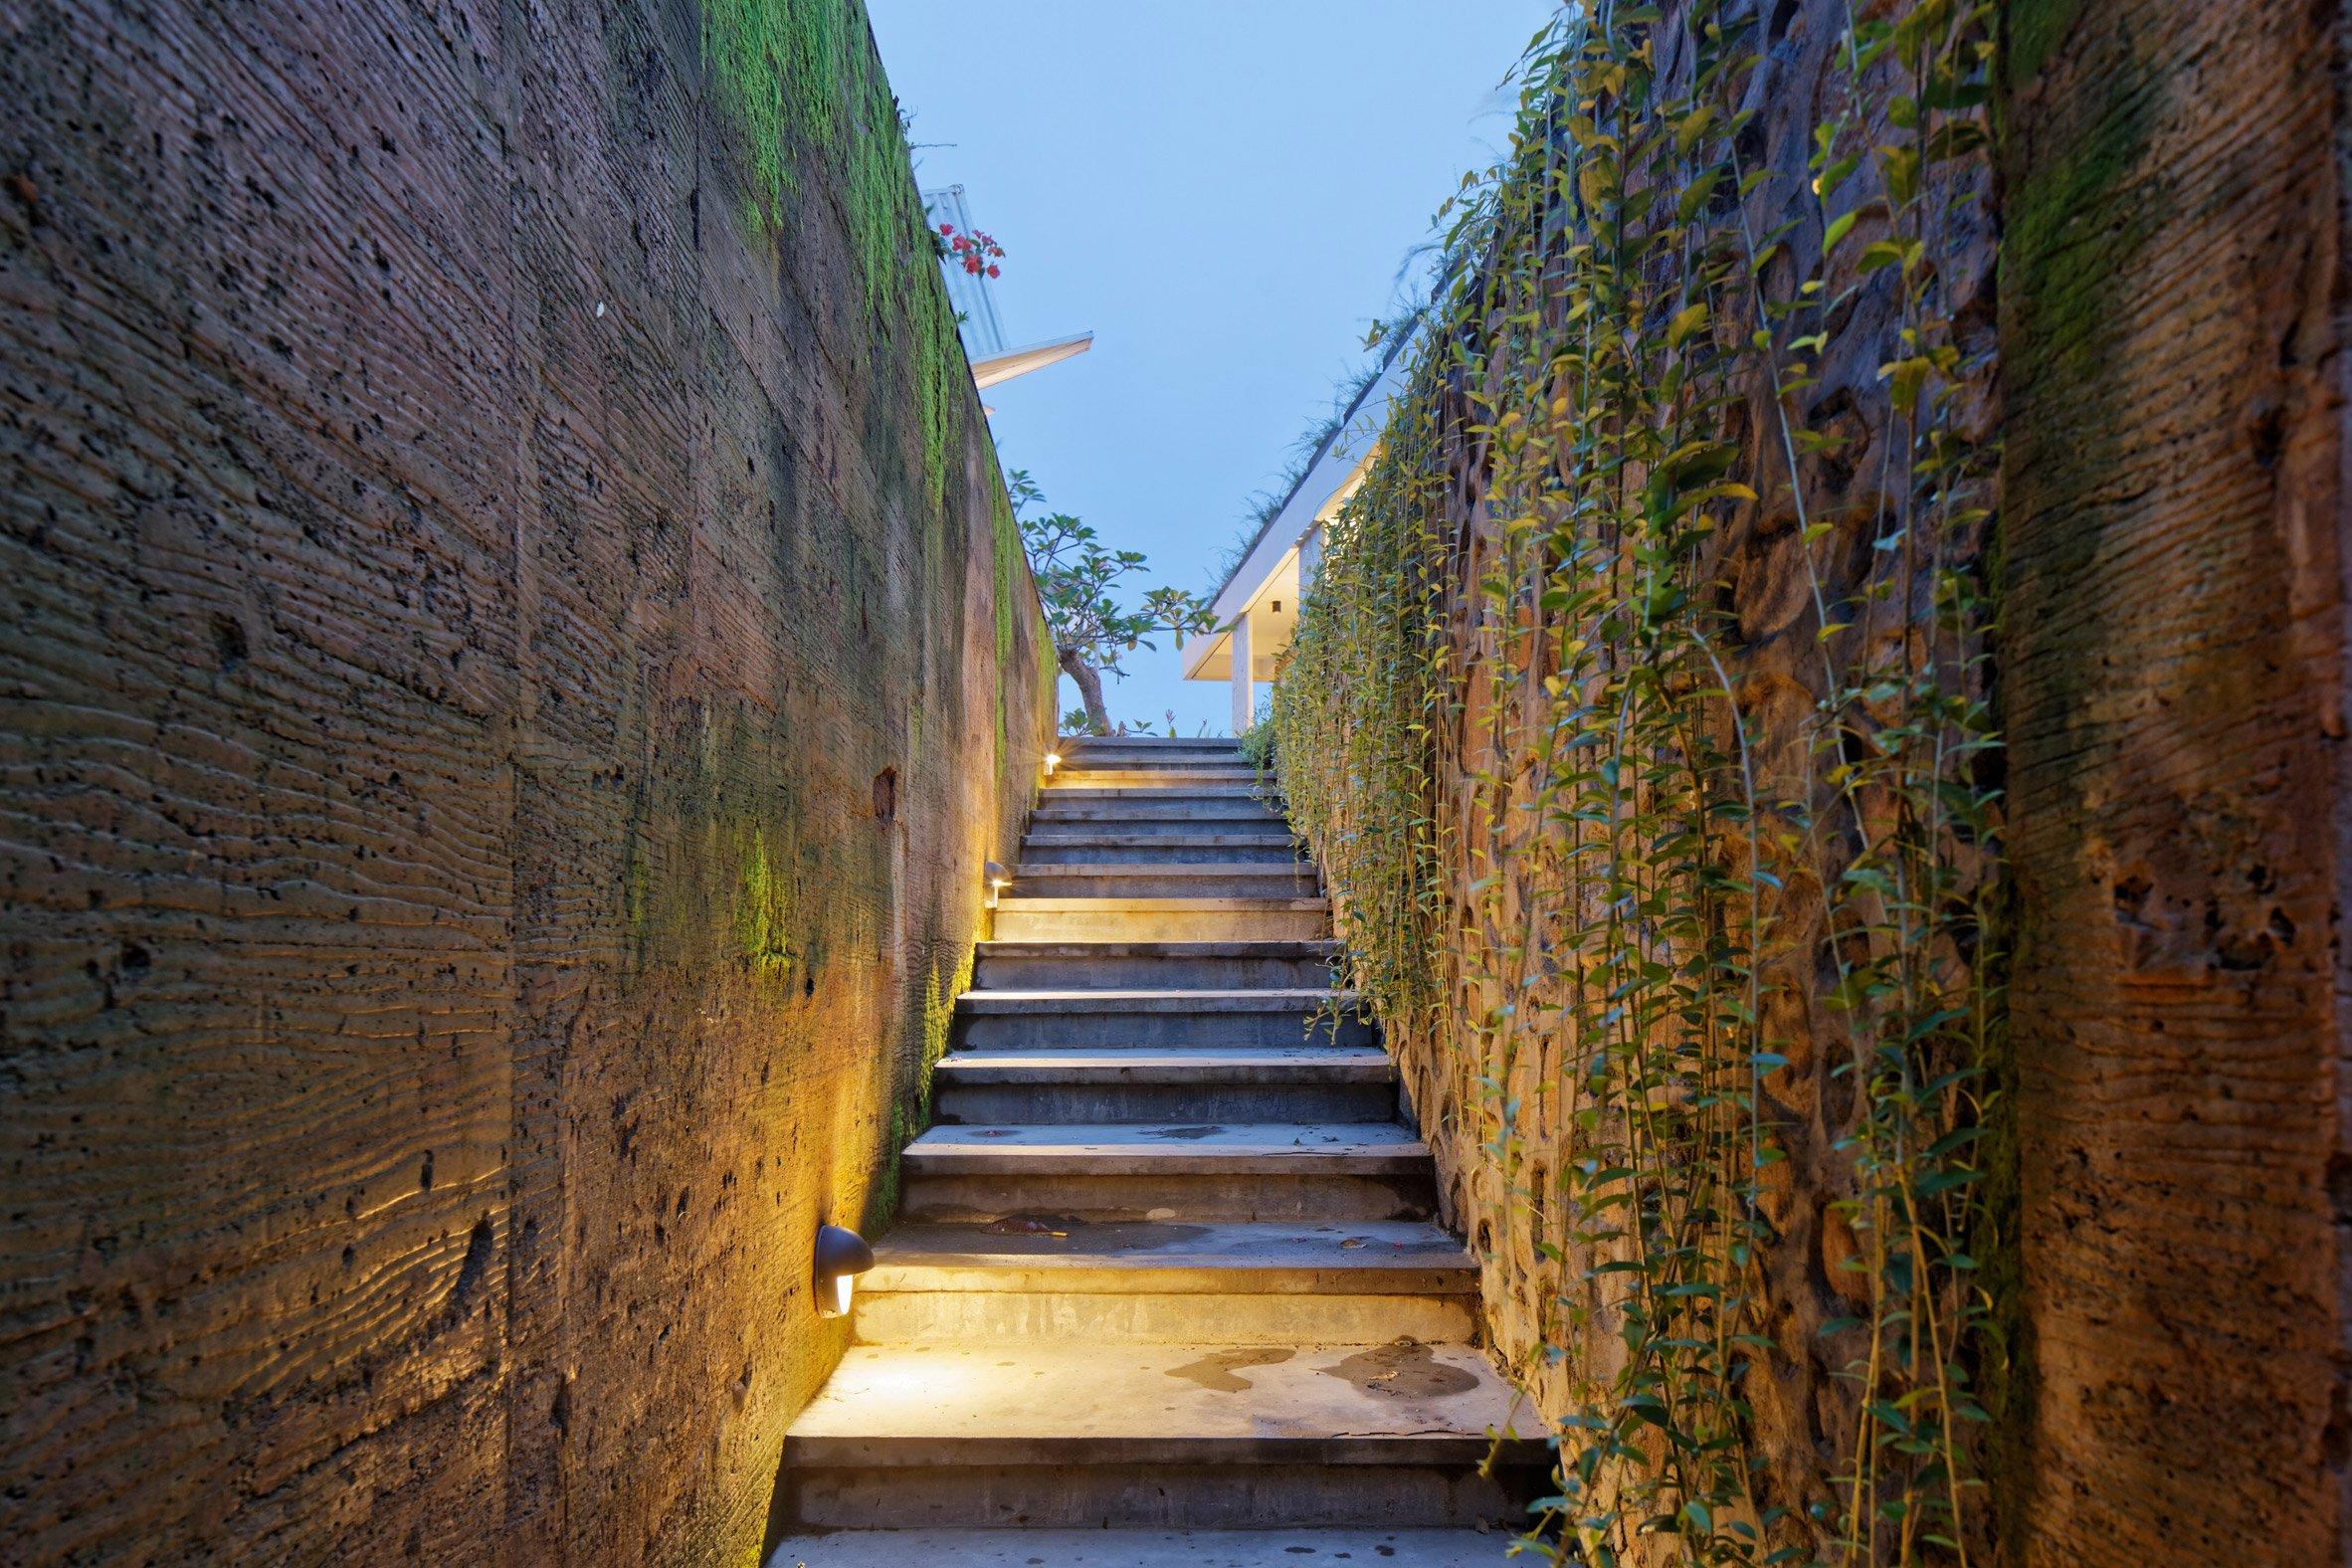 clay-house-budi-pradono-architects-architecture_dezeen_2364_col_11-1704x1136.jpg